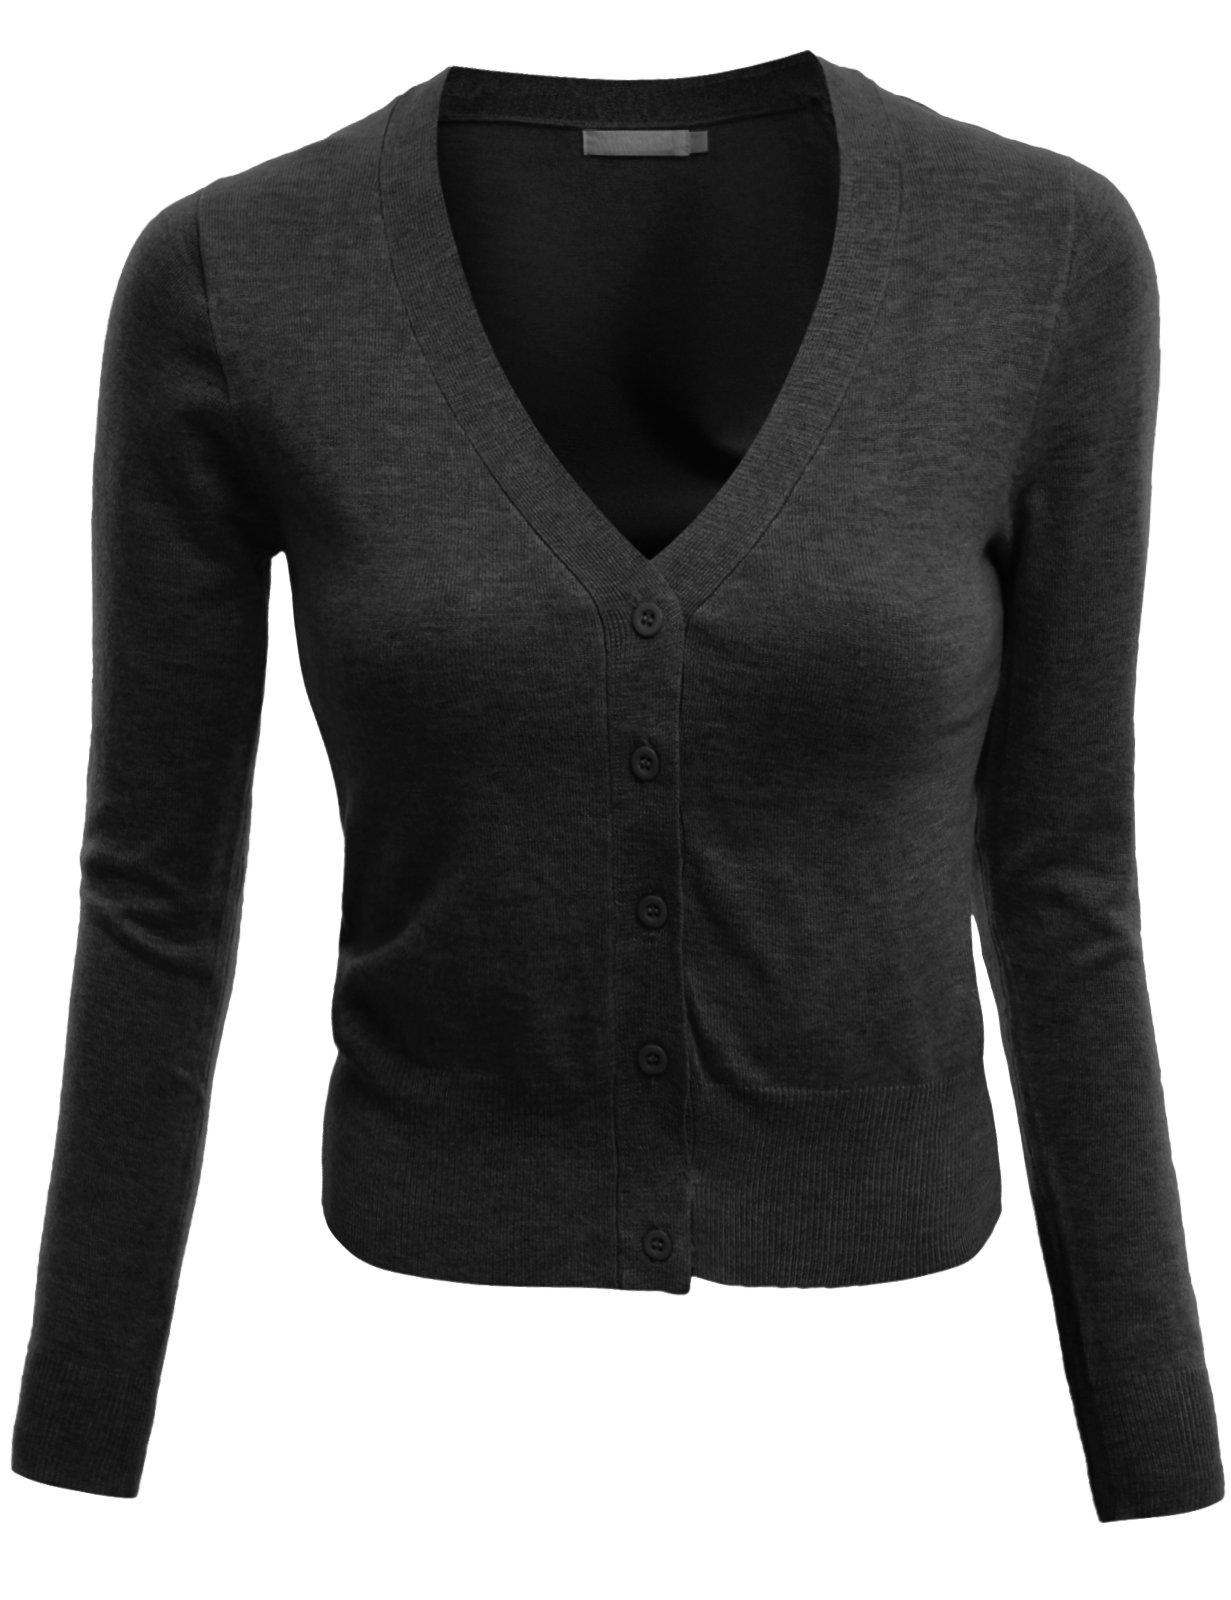 Doublju V-Neck Button Down Fine Knit Crop Cardigan (Plus size available) CHARCOAL X-LARGE